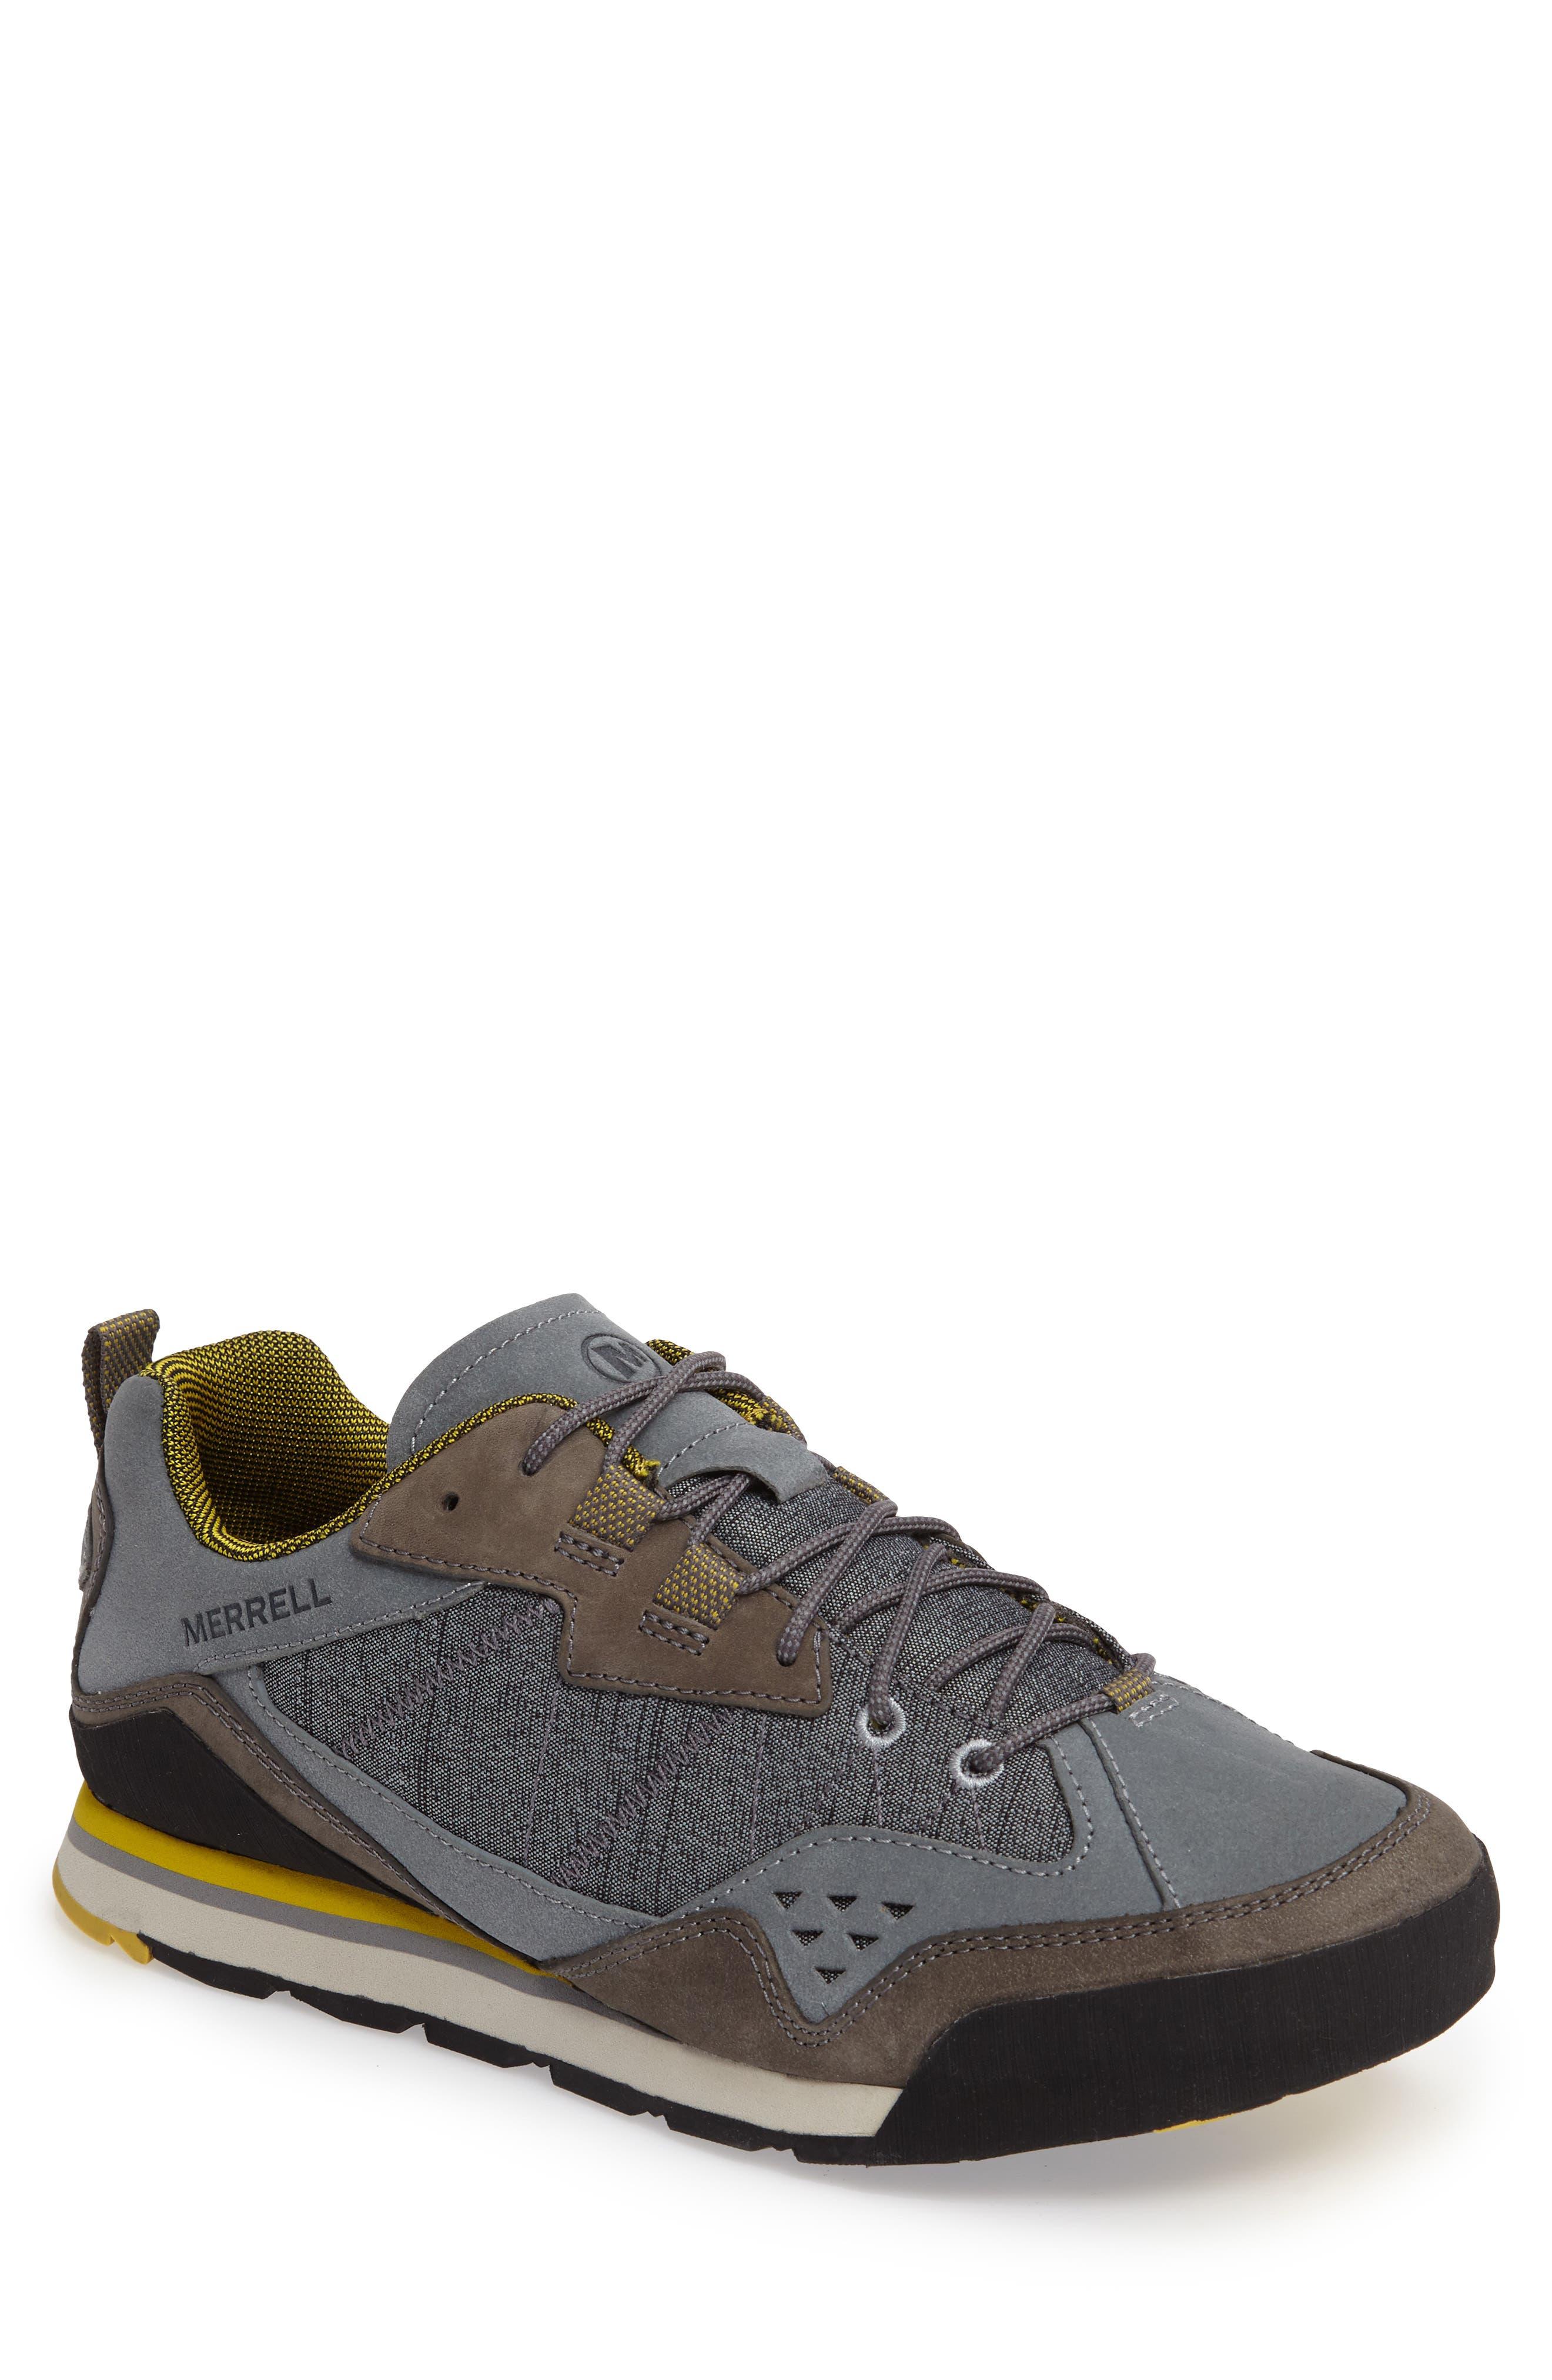 Men s Merrell Size Shoes